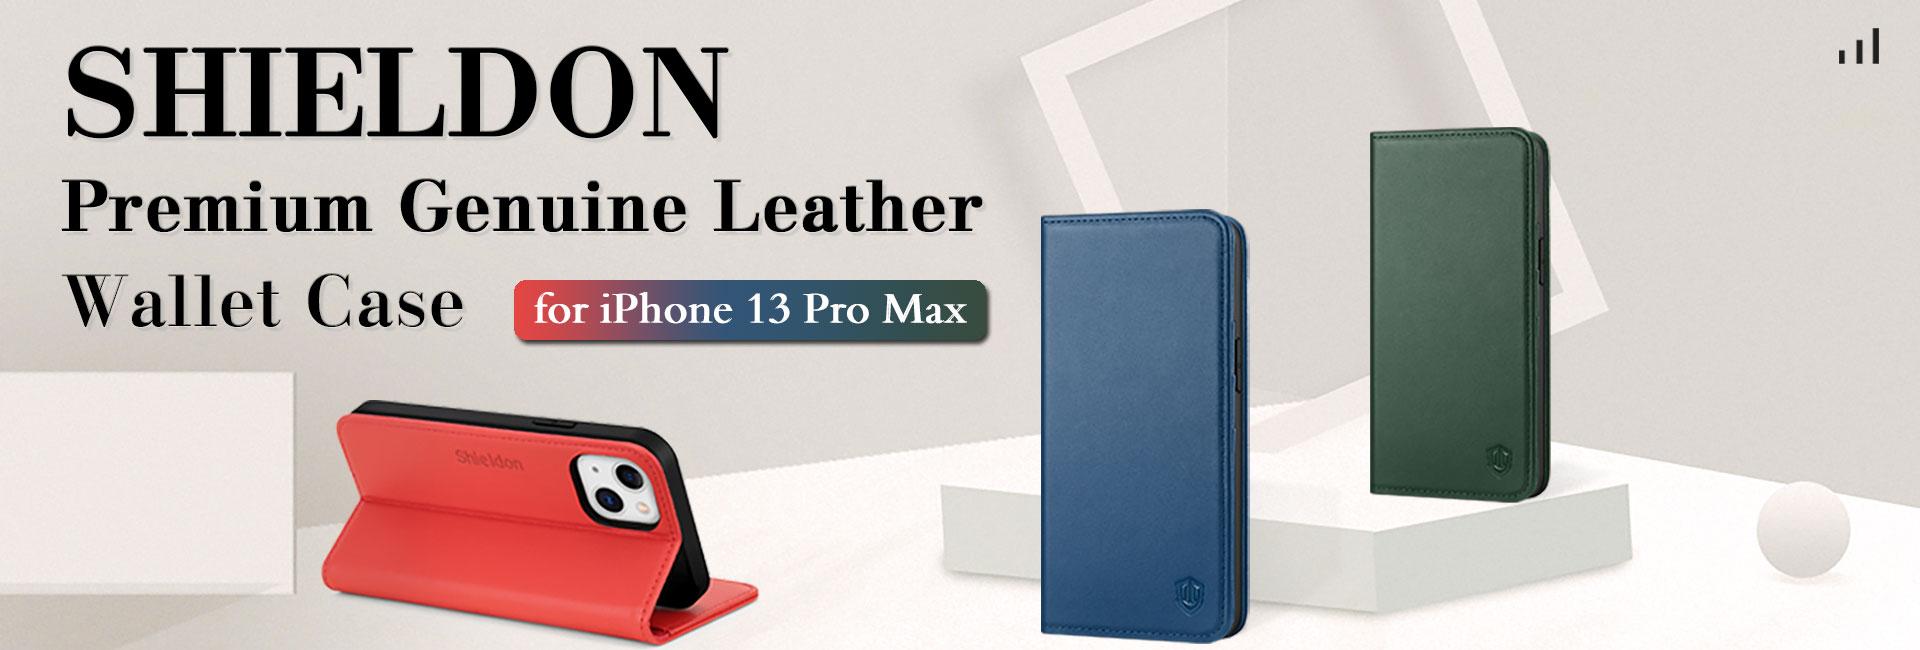 Shieldon iPhone 13 Pro Max Wallet Case